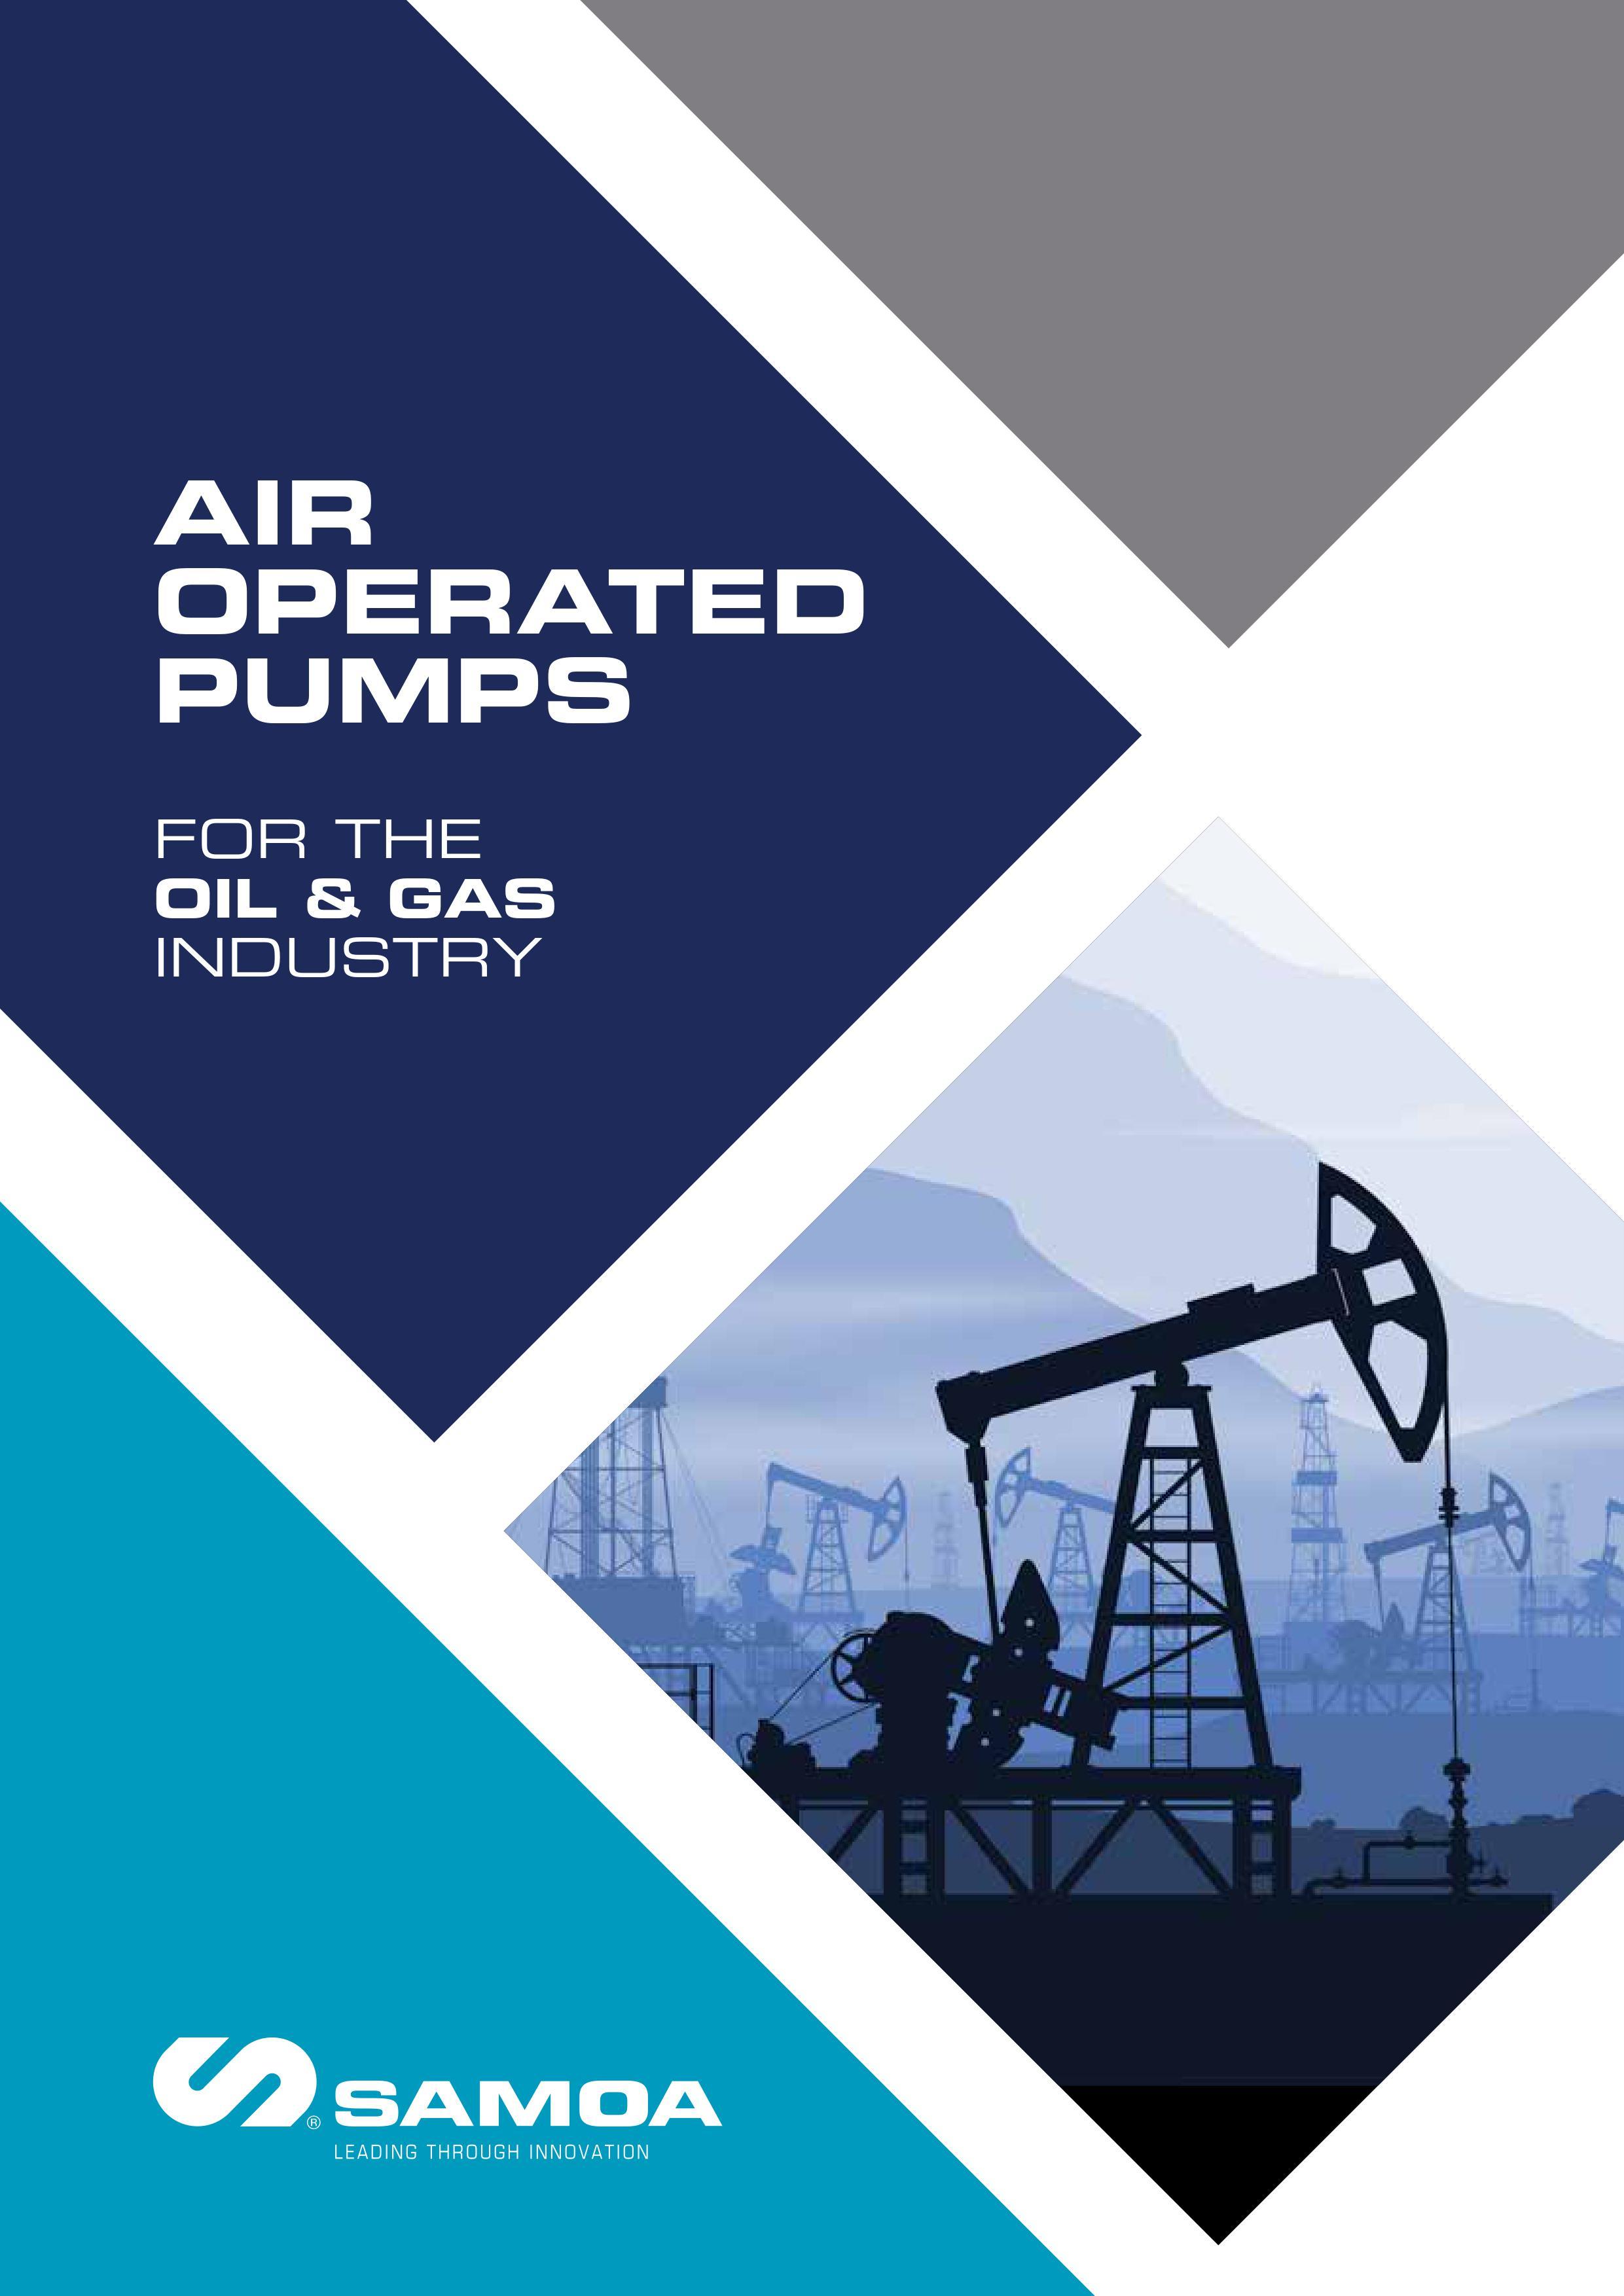 SAMOA Oil & Gas Speciality Pumps Brochure